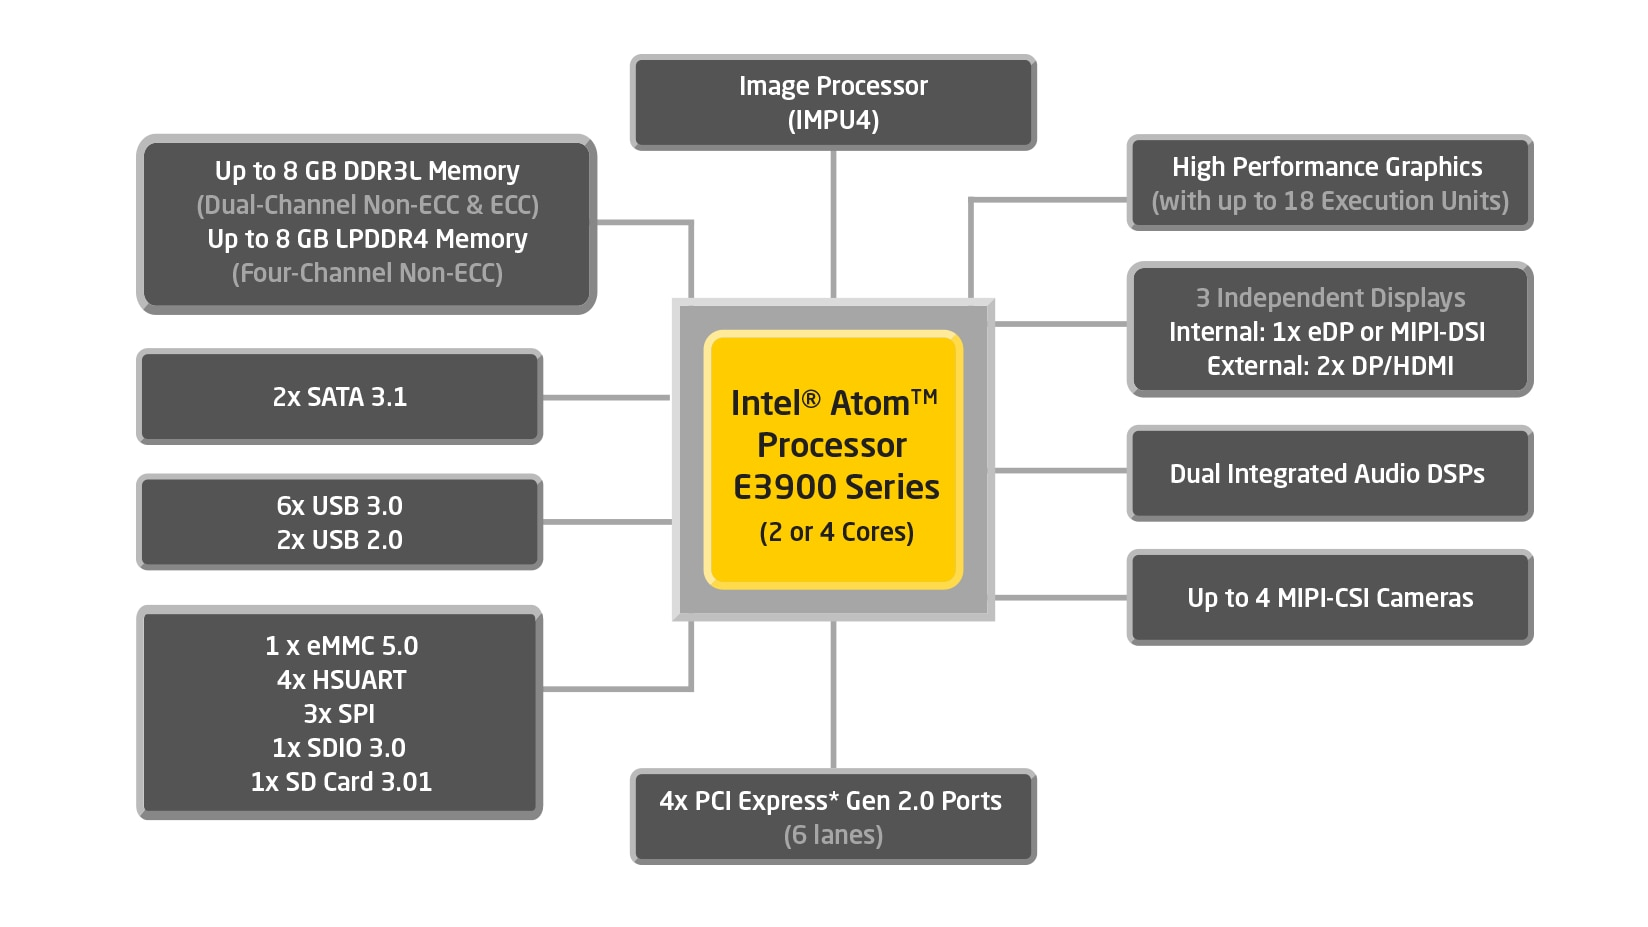 intel u00ae atom u2122 processor e3900 series  specifications